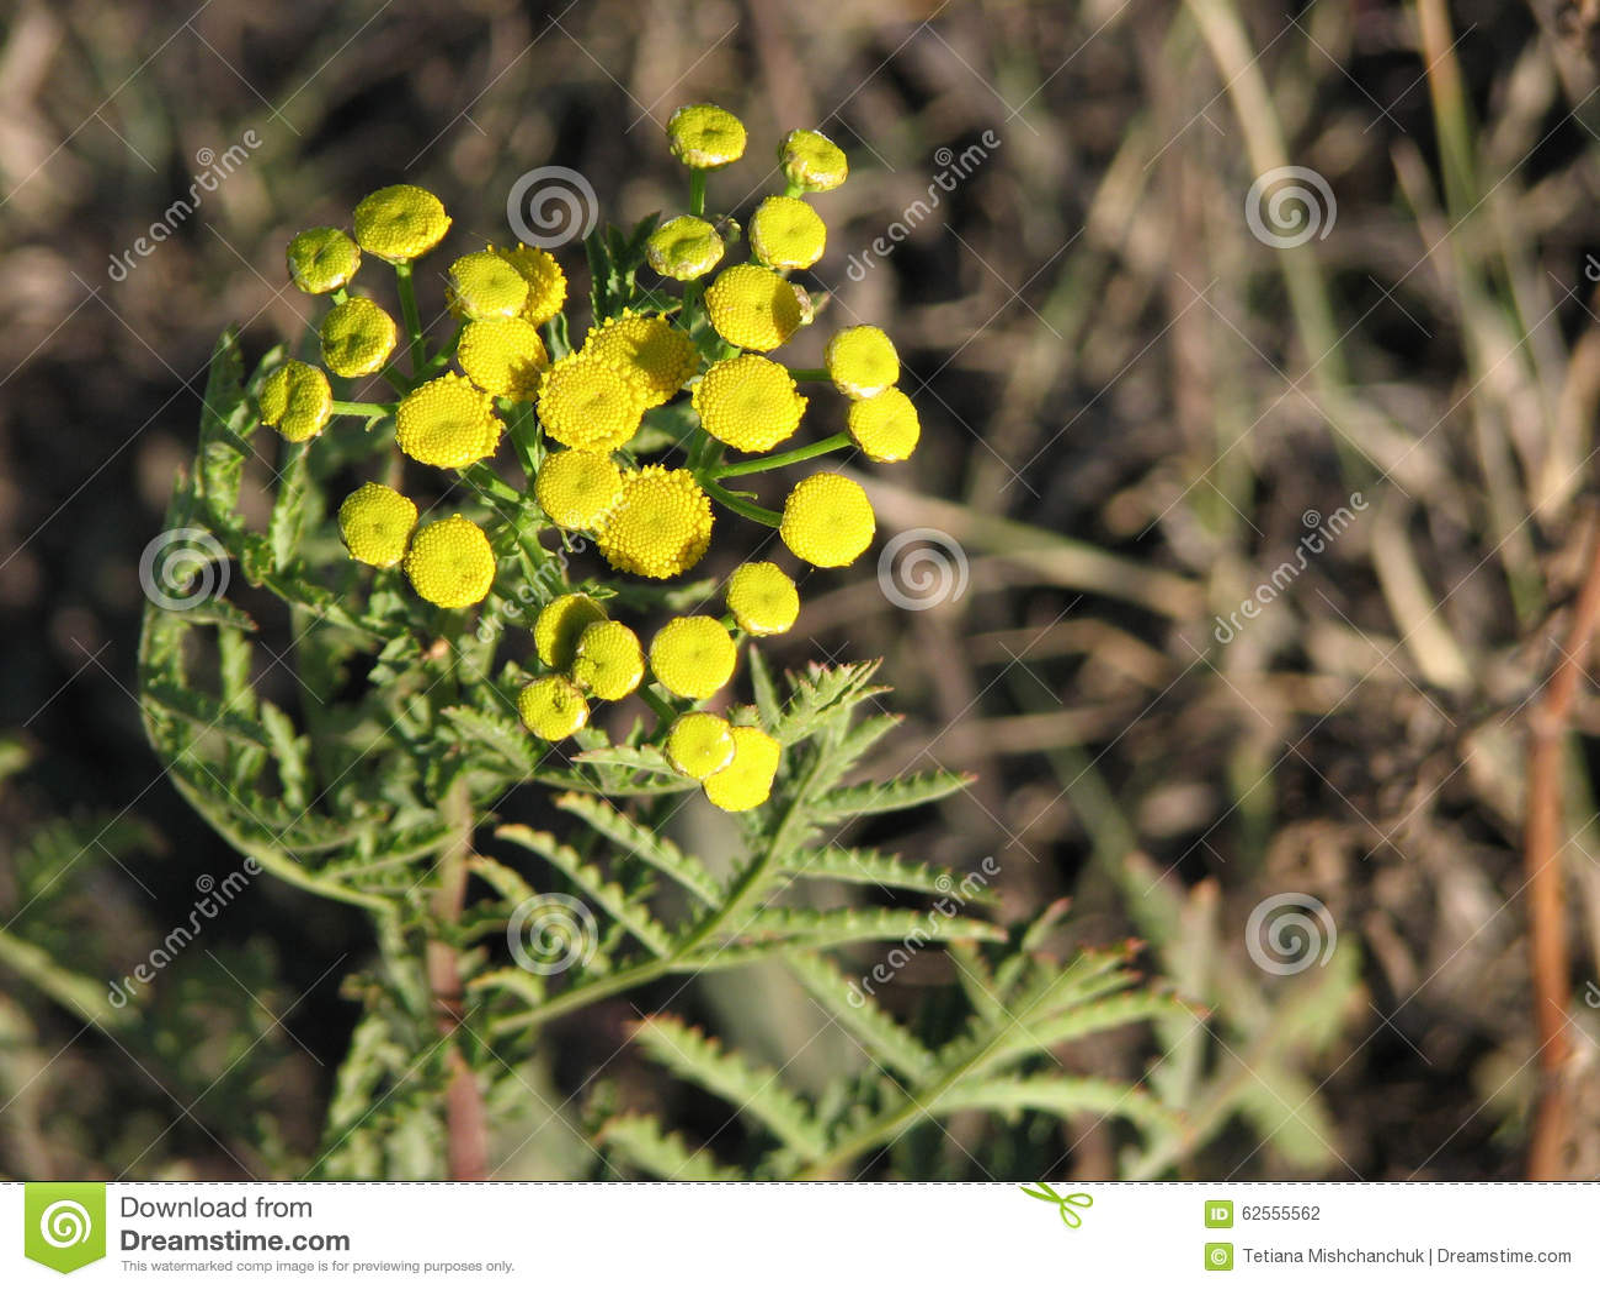 petites fleurs sauvages jaunes stock images 65 photos. Black Bedroom Furniture Sets. Home Design Ideas